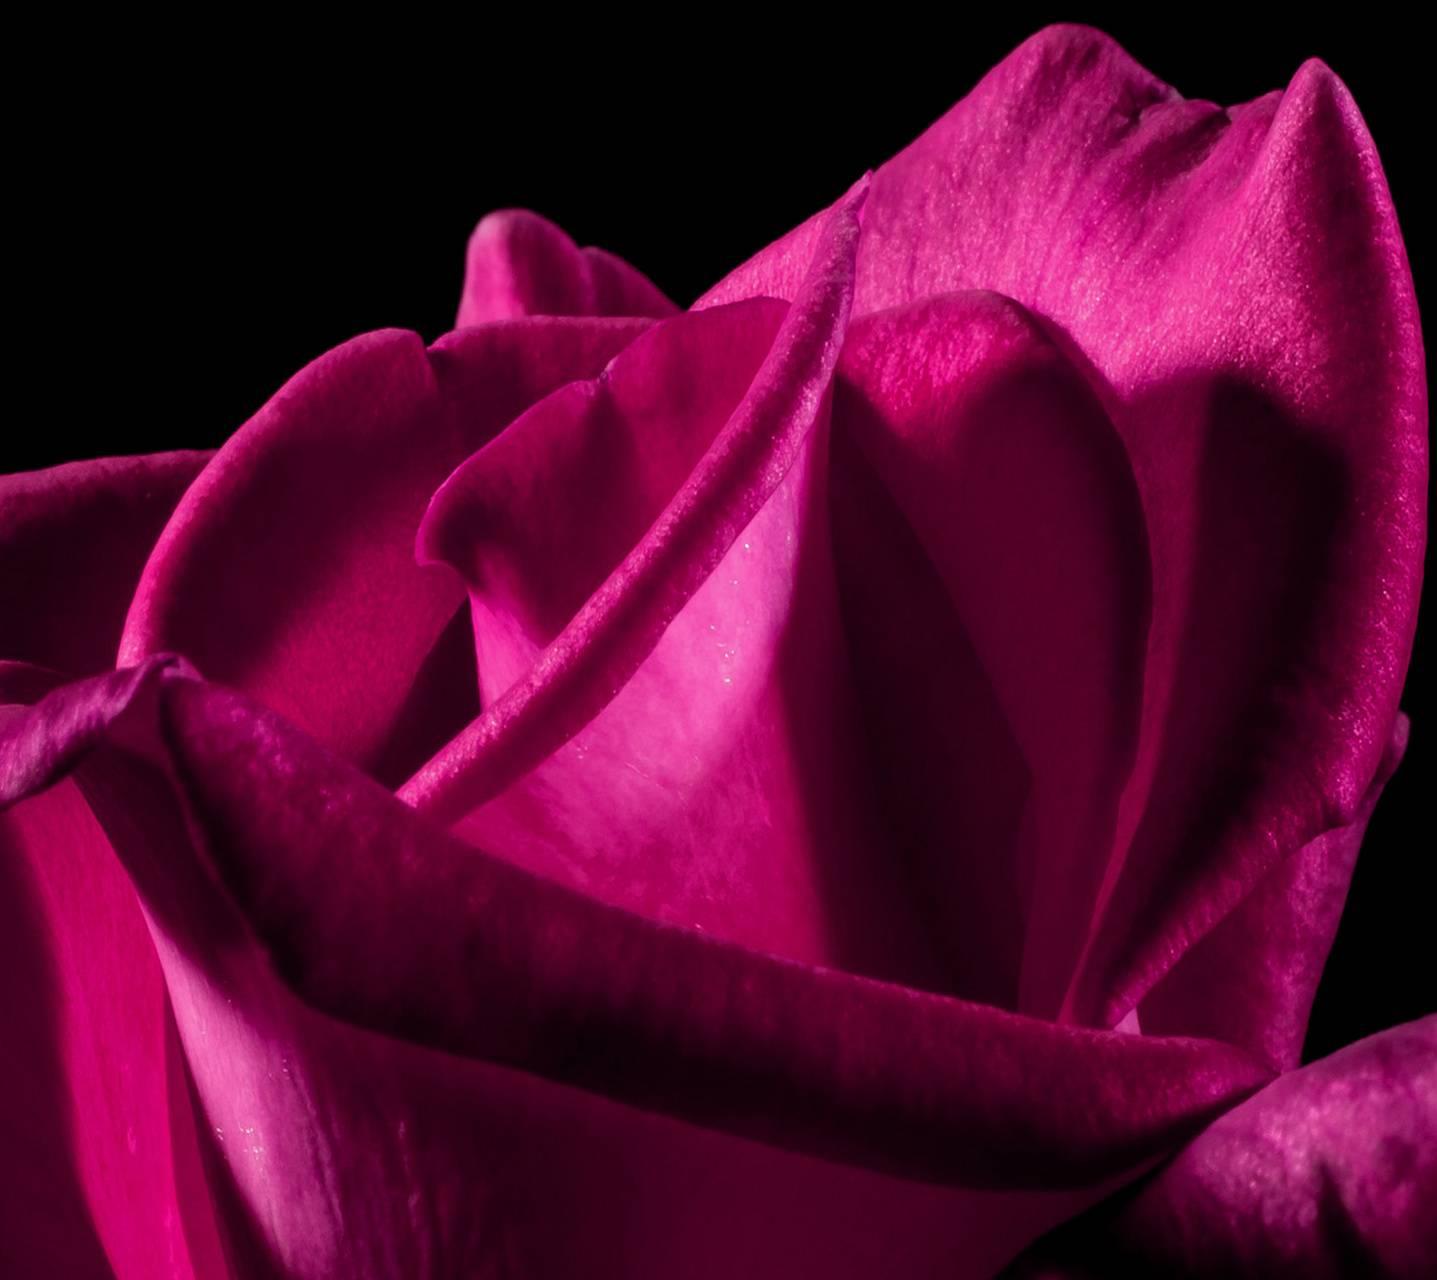 rosey pinky